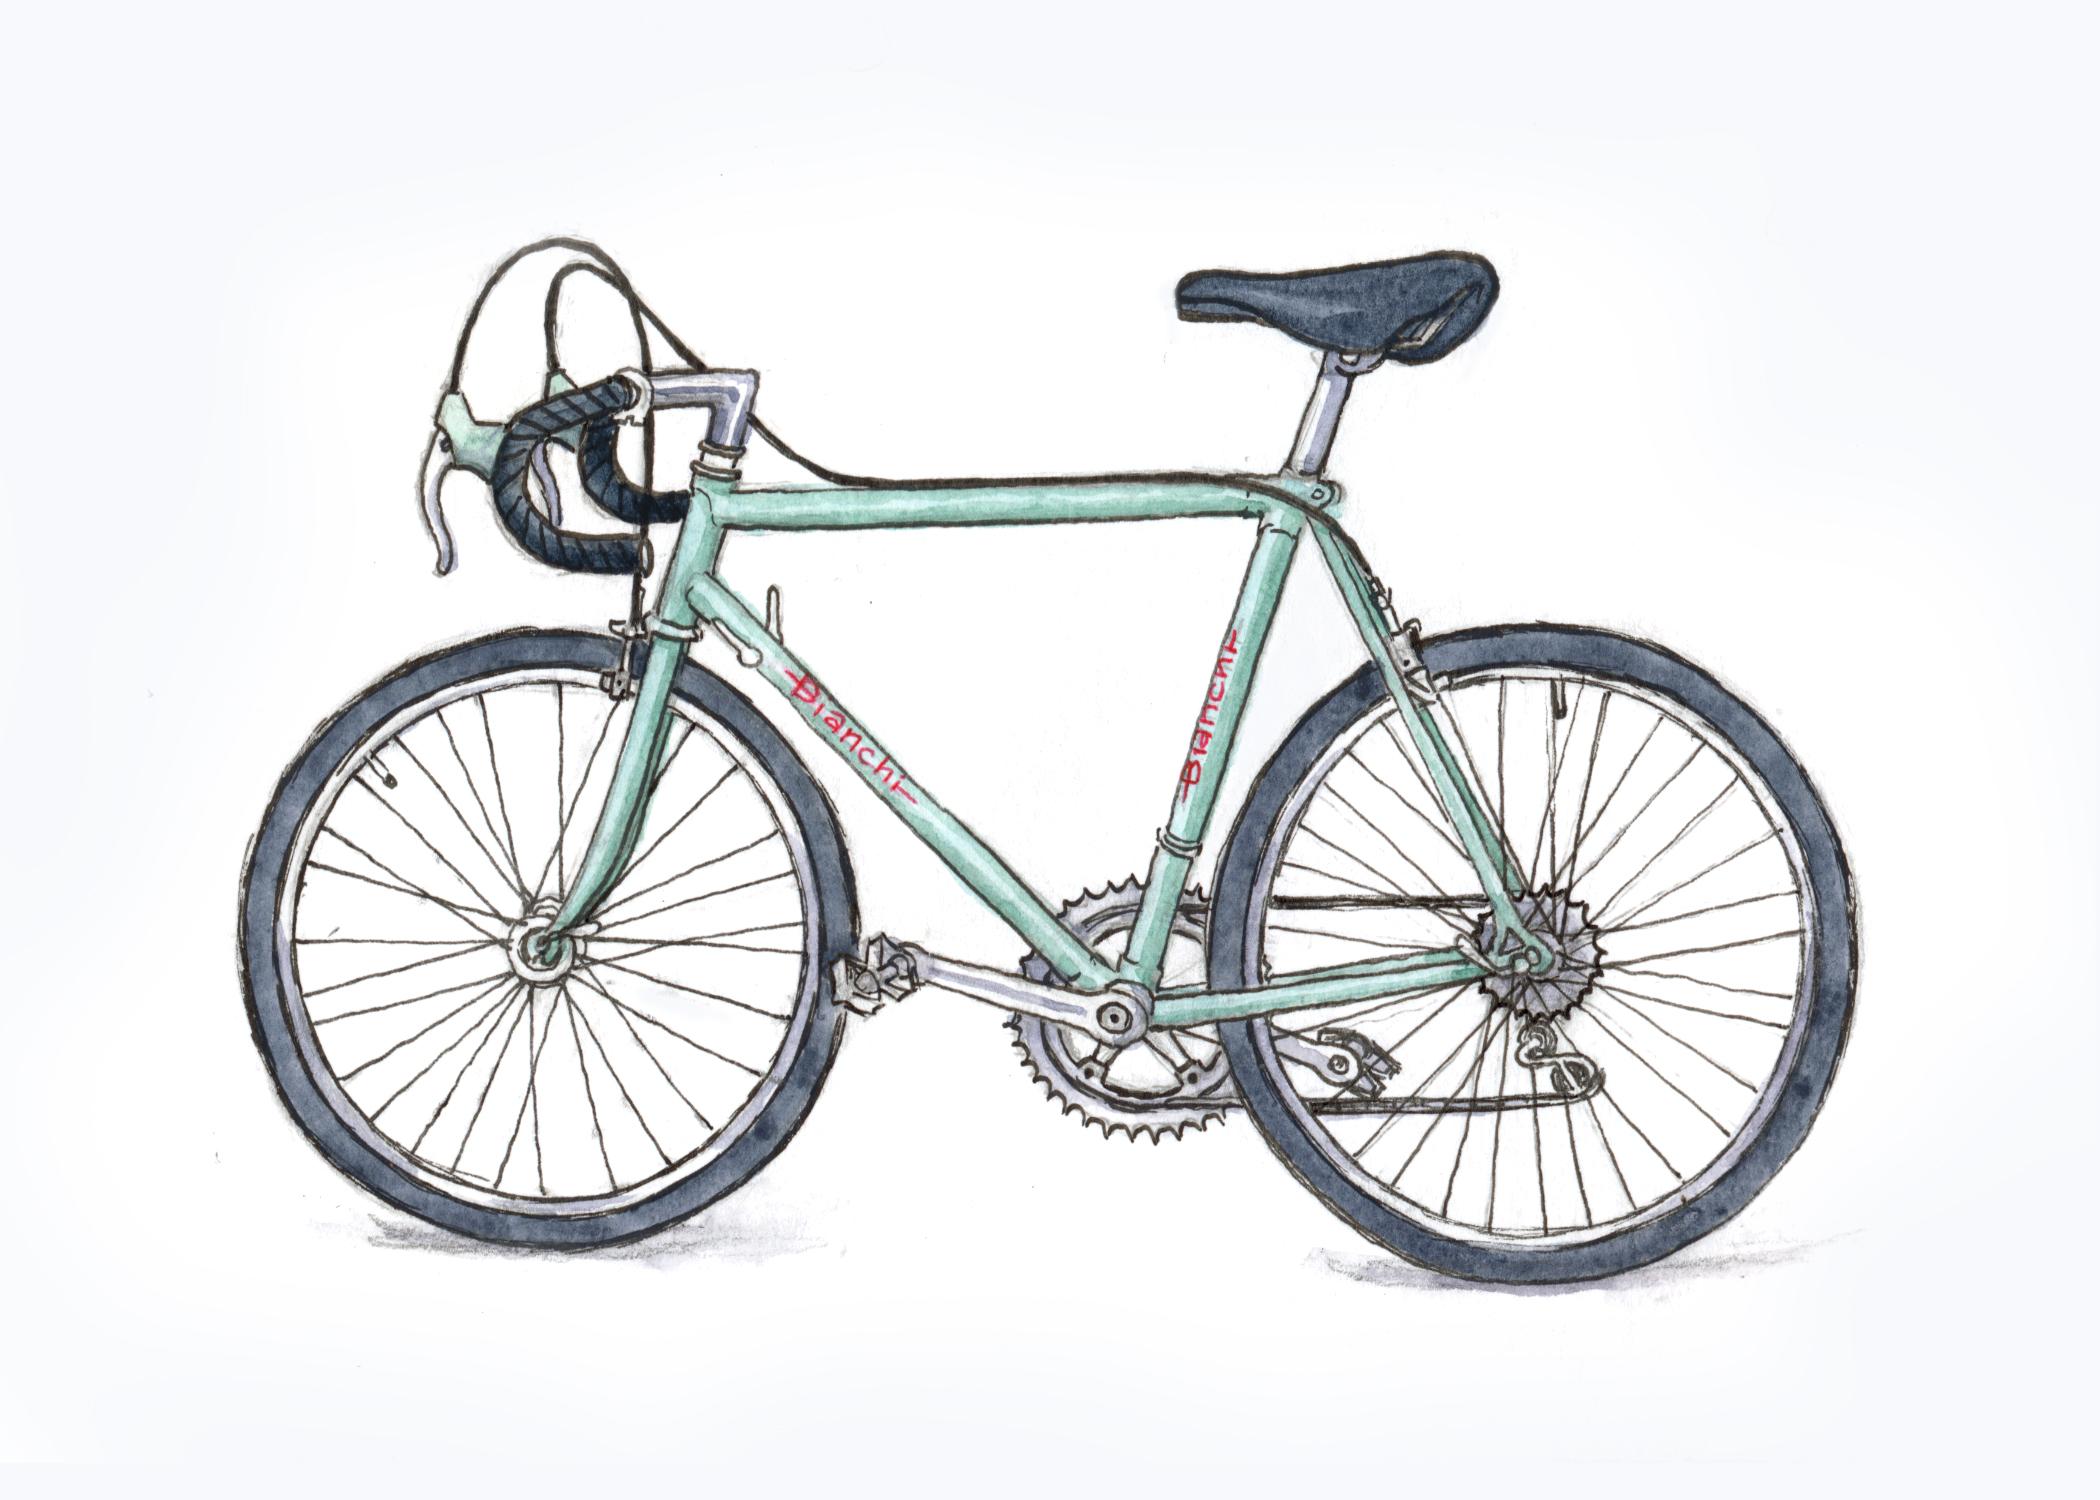 Bianchi Bike 1983